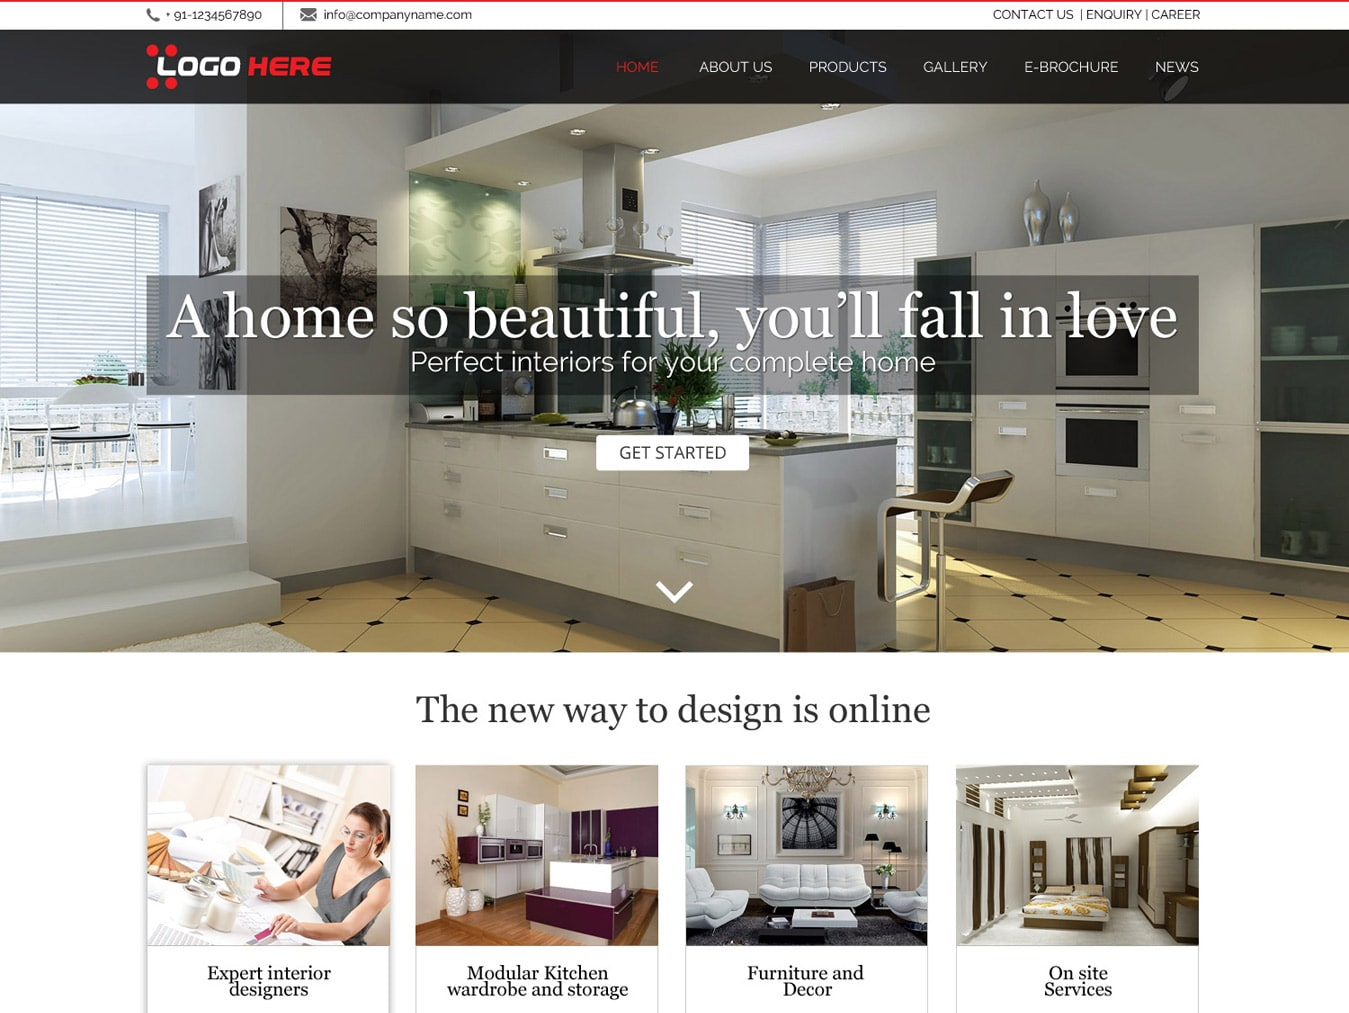 Interior website design template free psd design for Online interior design software free download